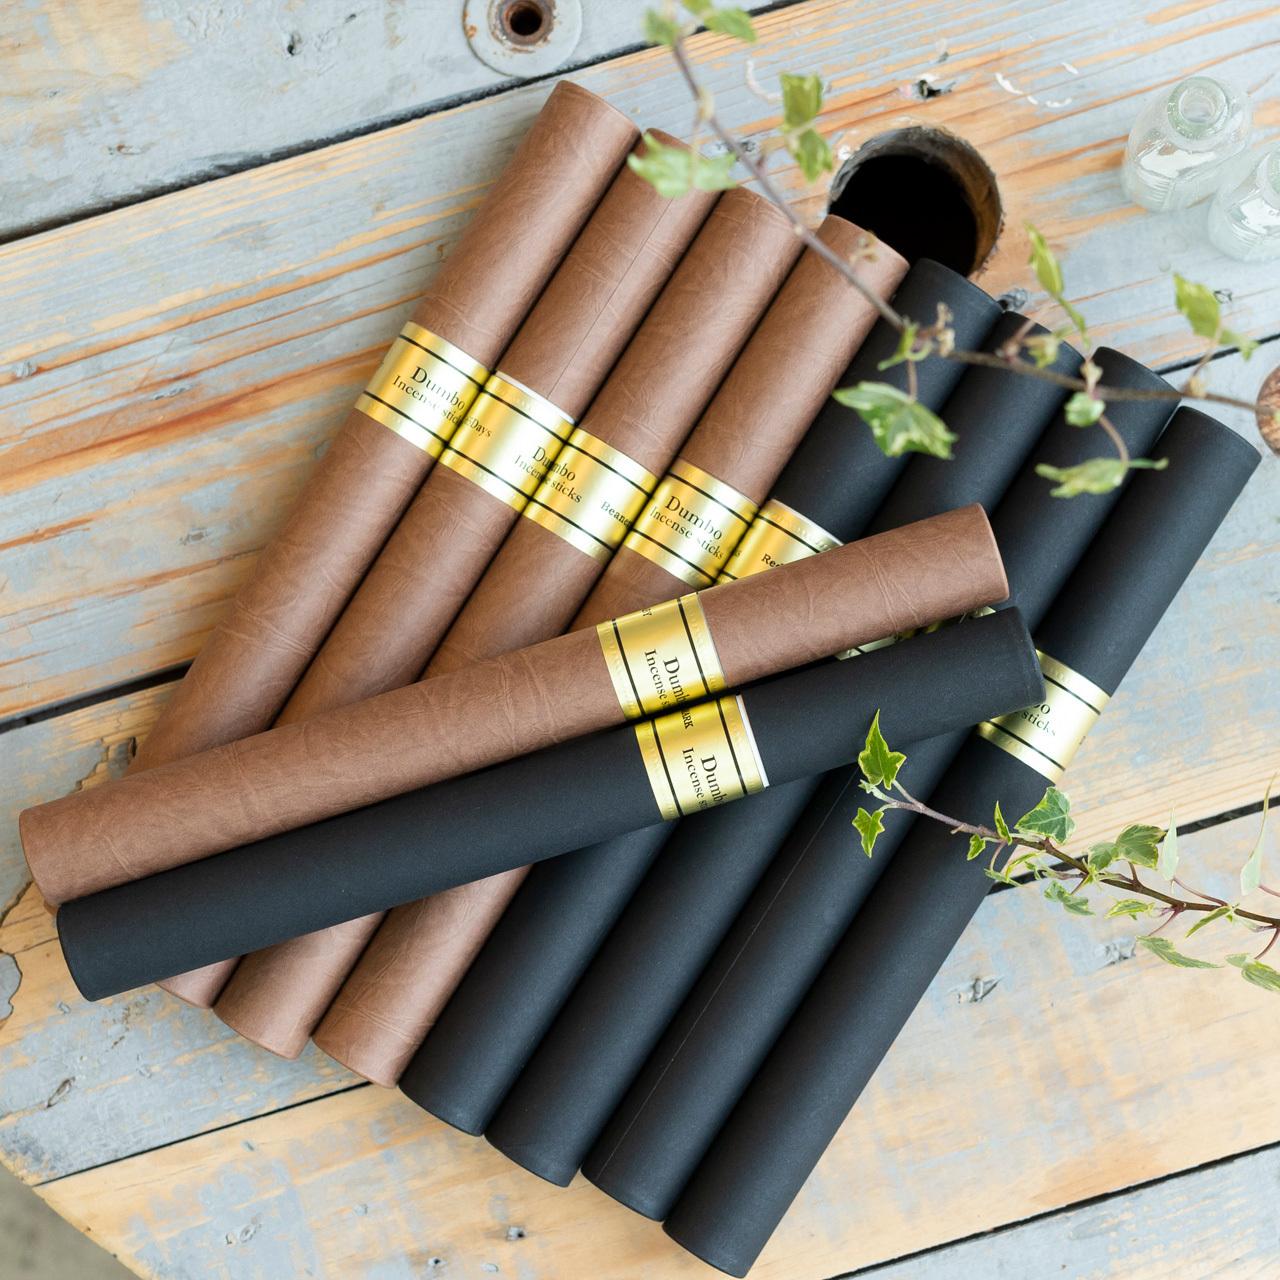 Dumbo Incense sticks